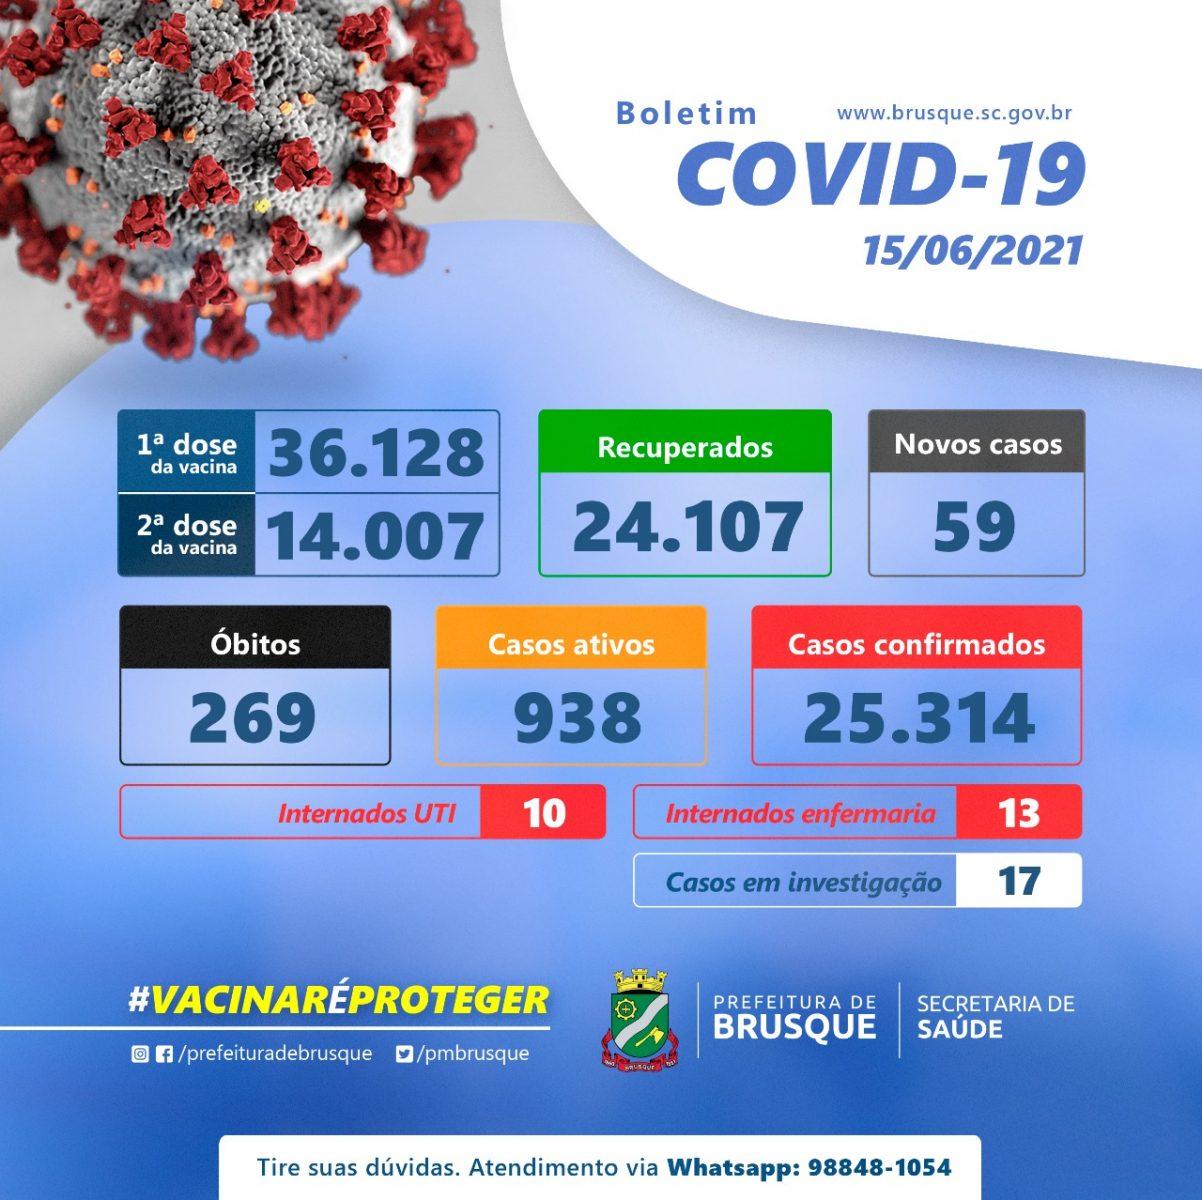 Covid-19: Confira o boletim epidemiológico desta terça-feira (15)